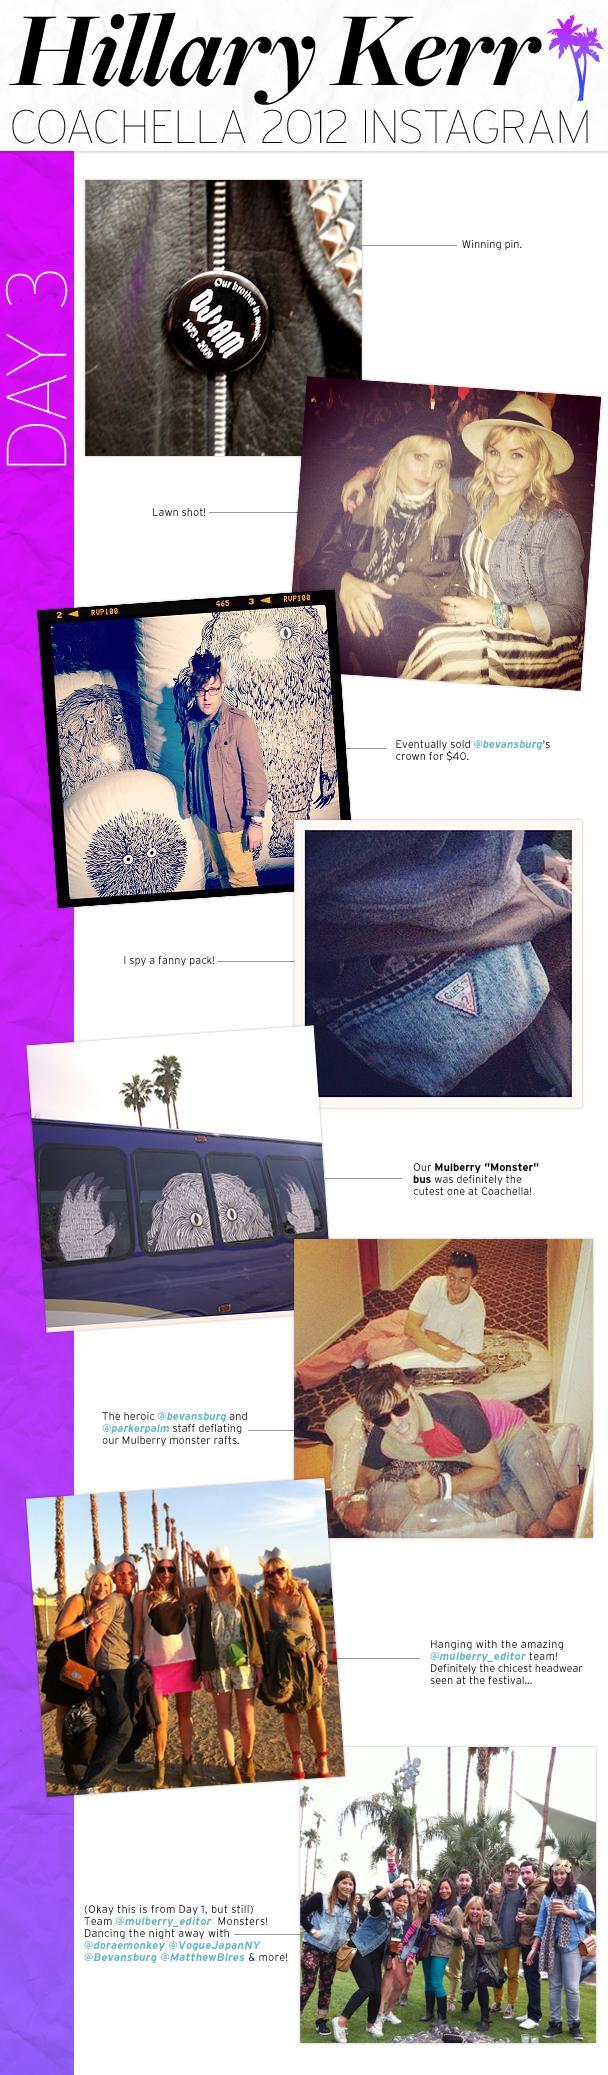 Hillary Kerr's Coachella Instagram: Day 3